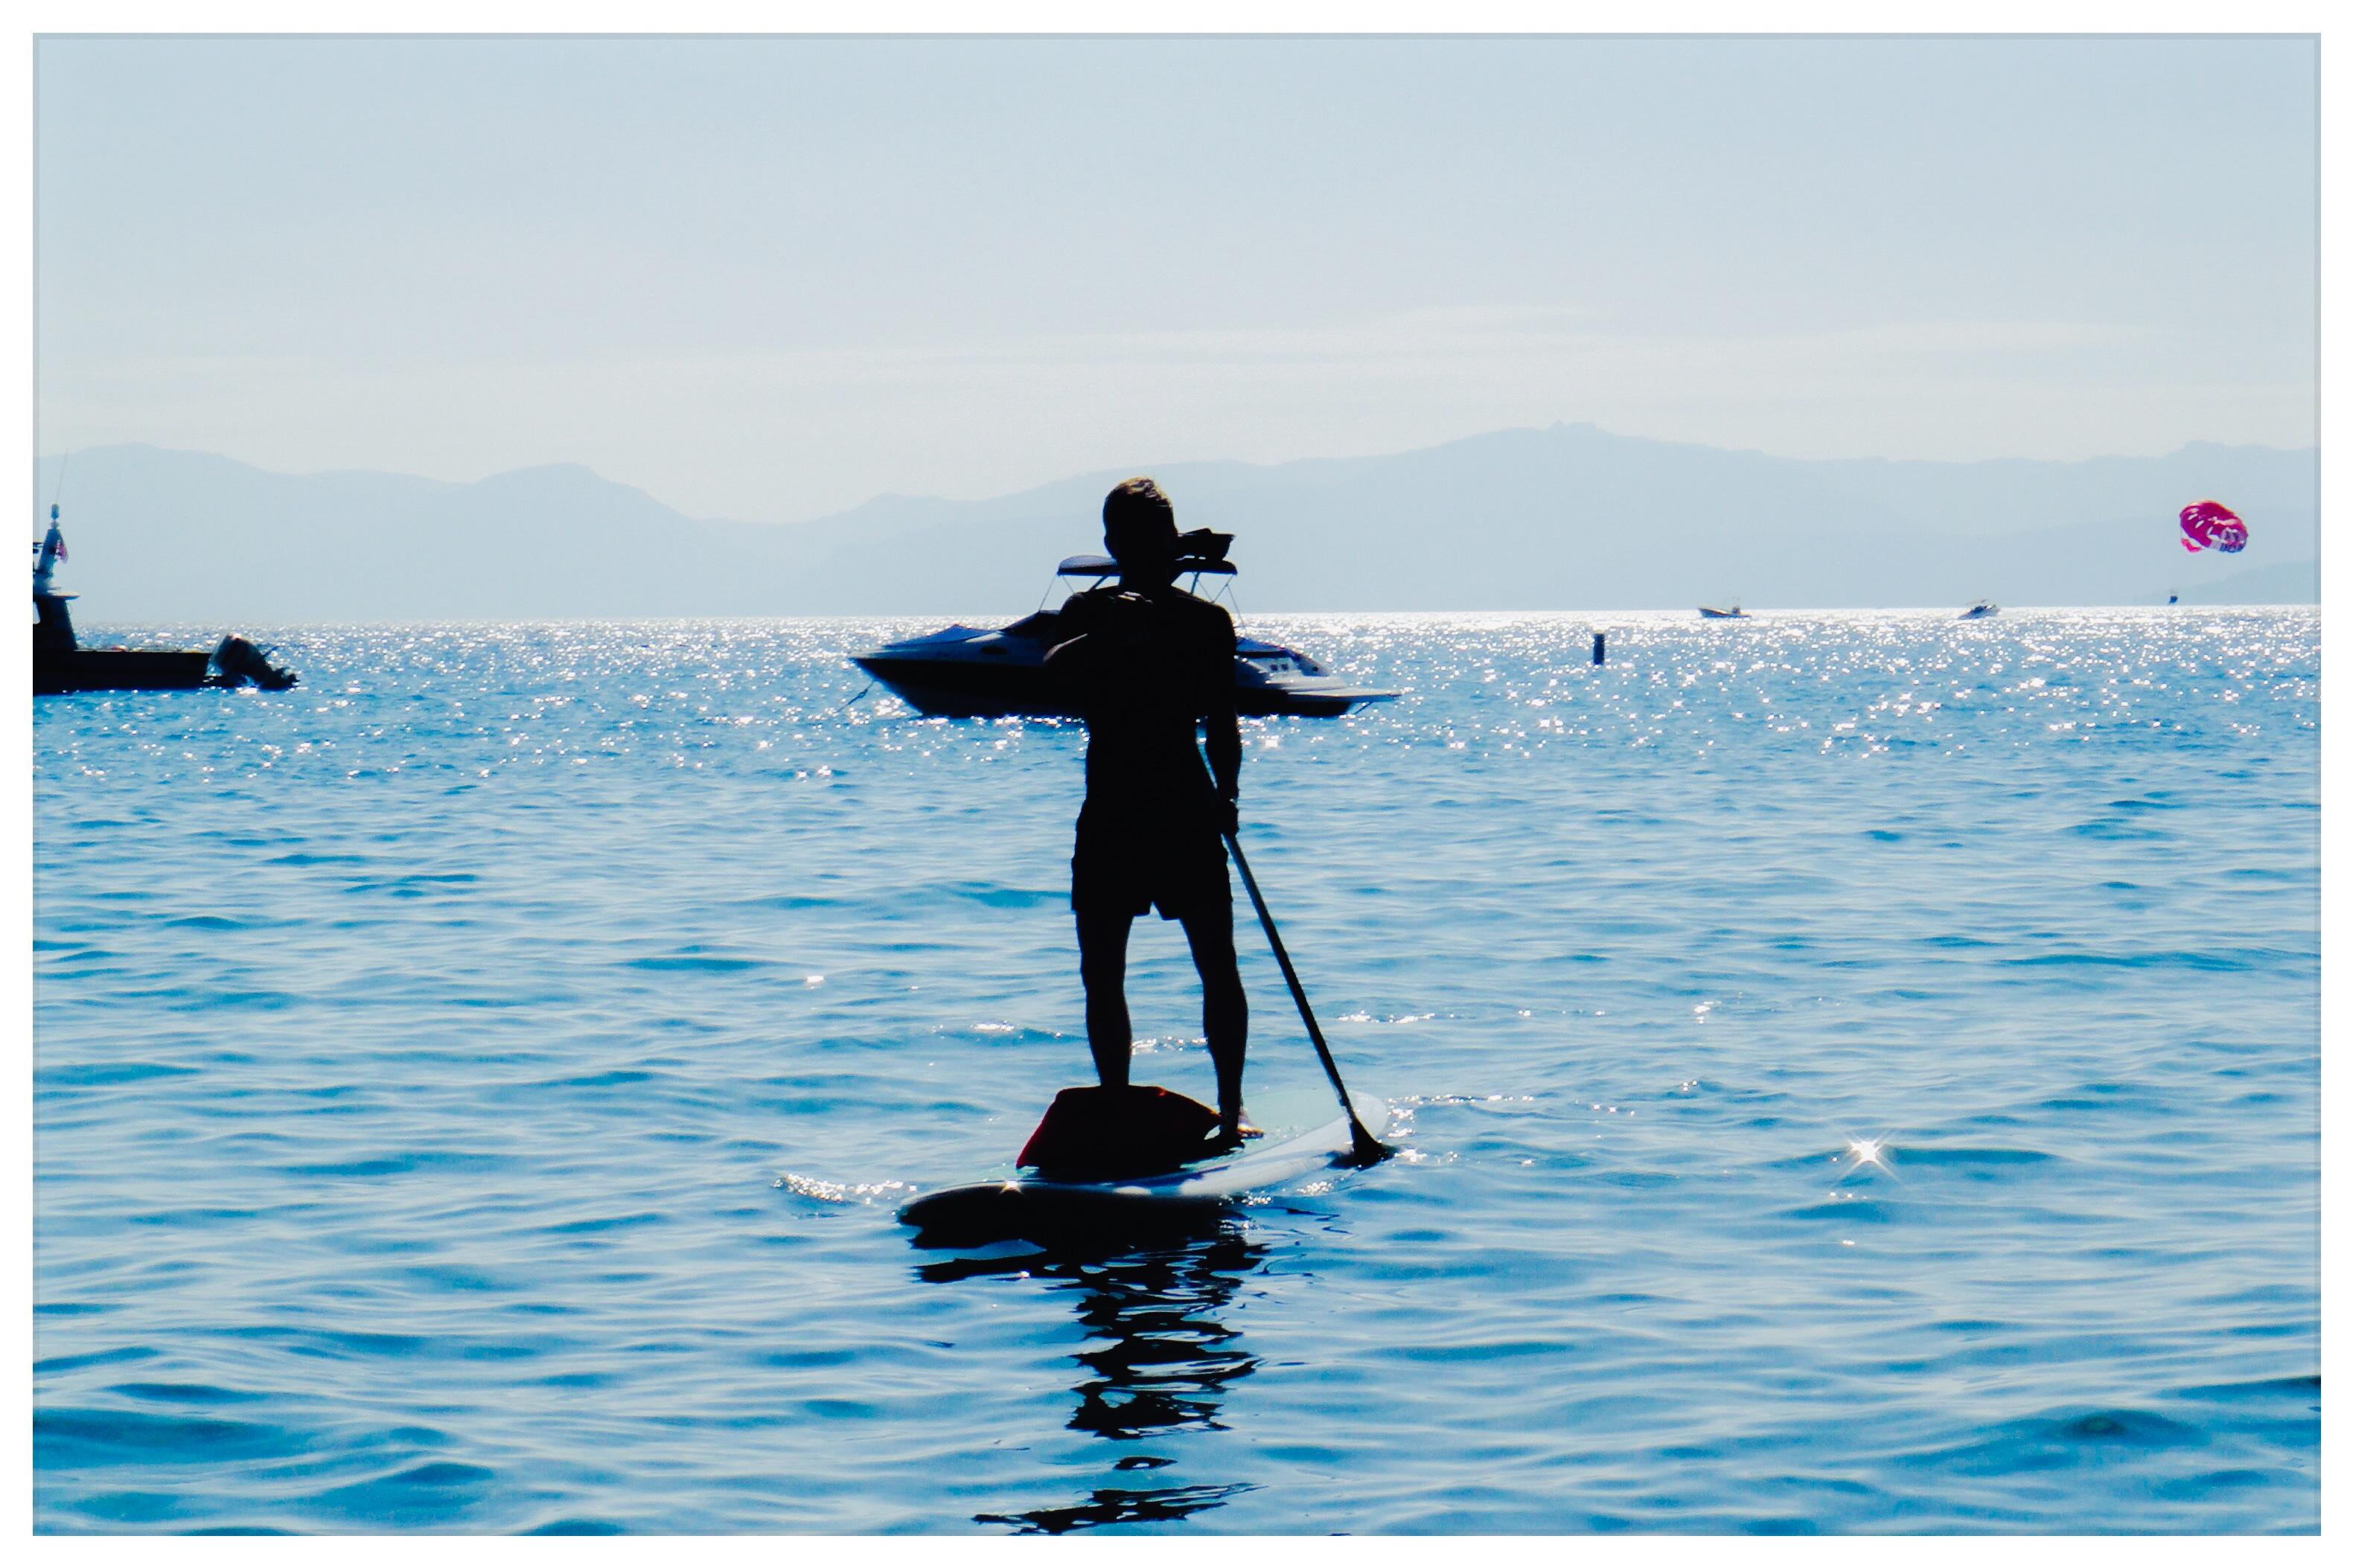 Hyatt Lake Tahoe, Stand-up Paddling